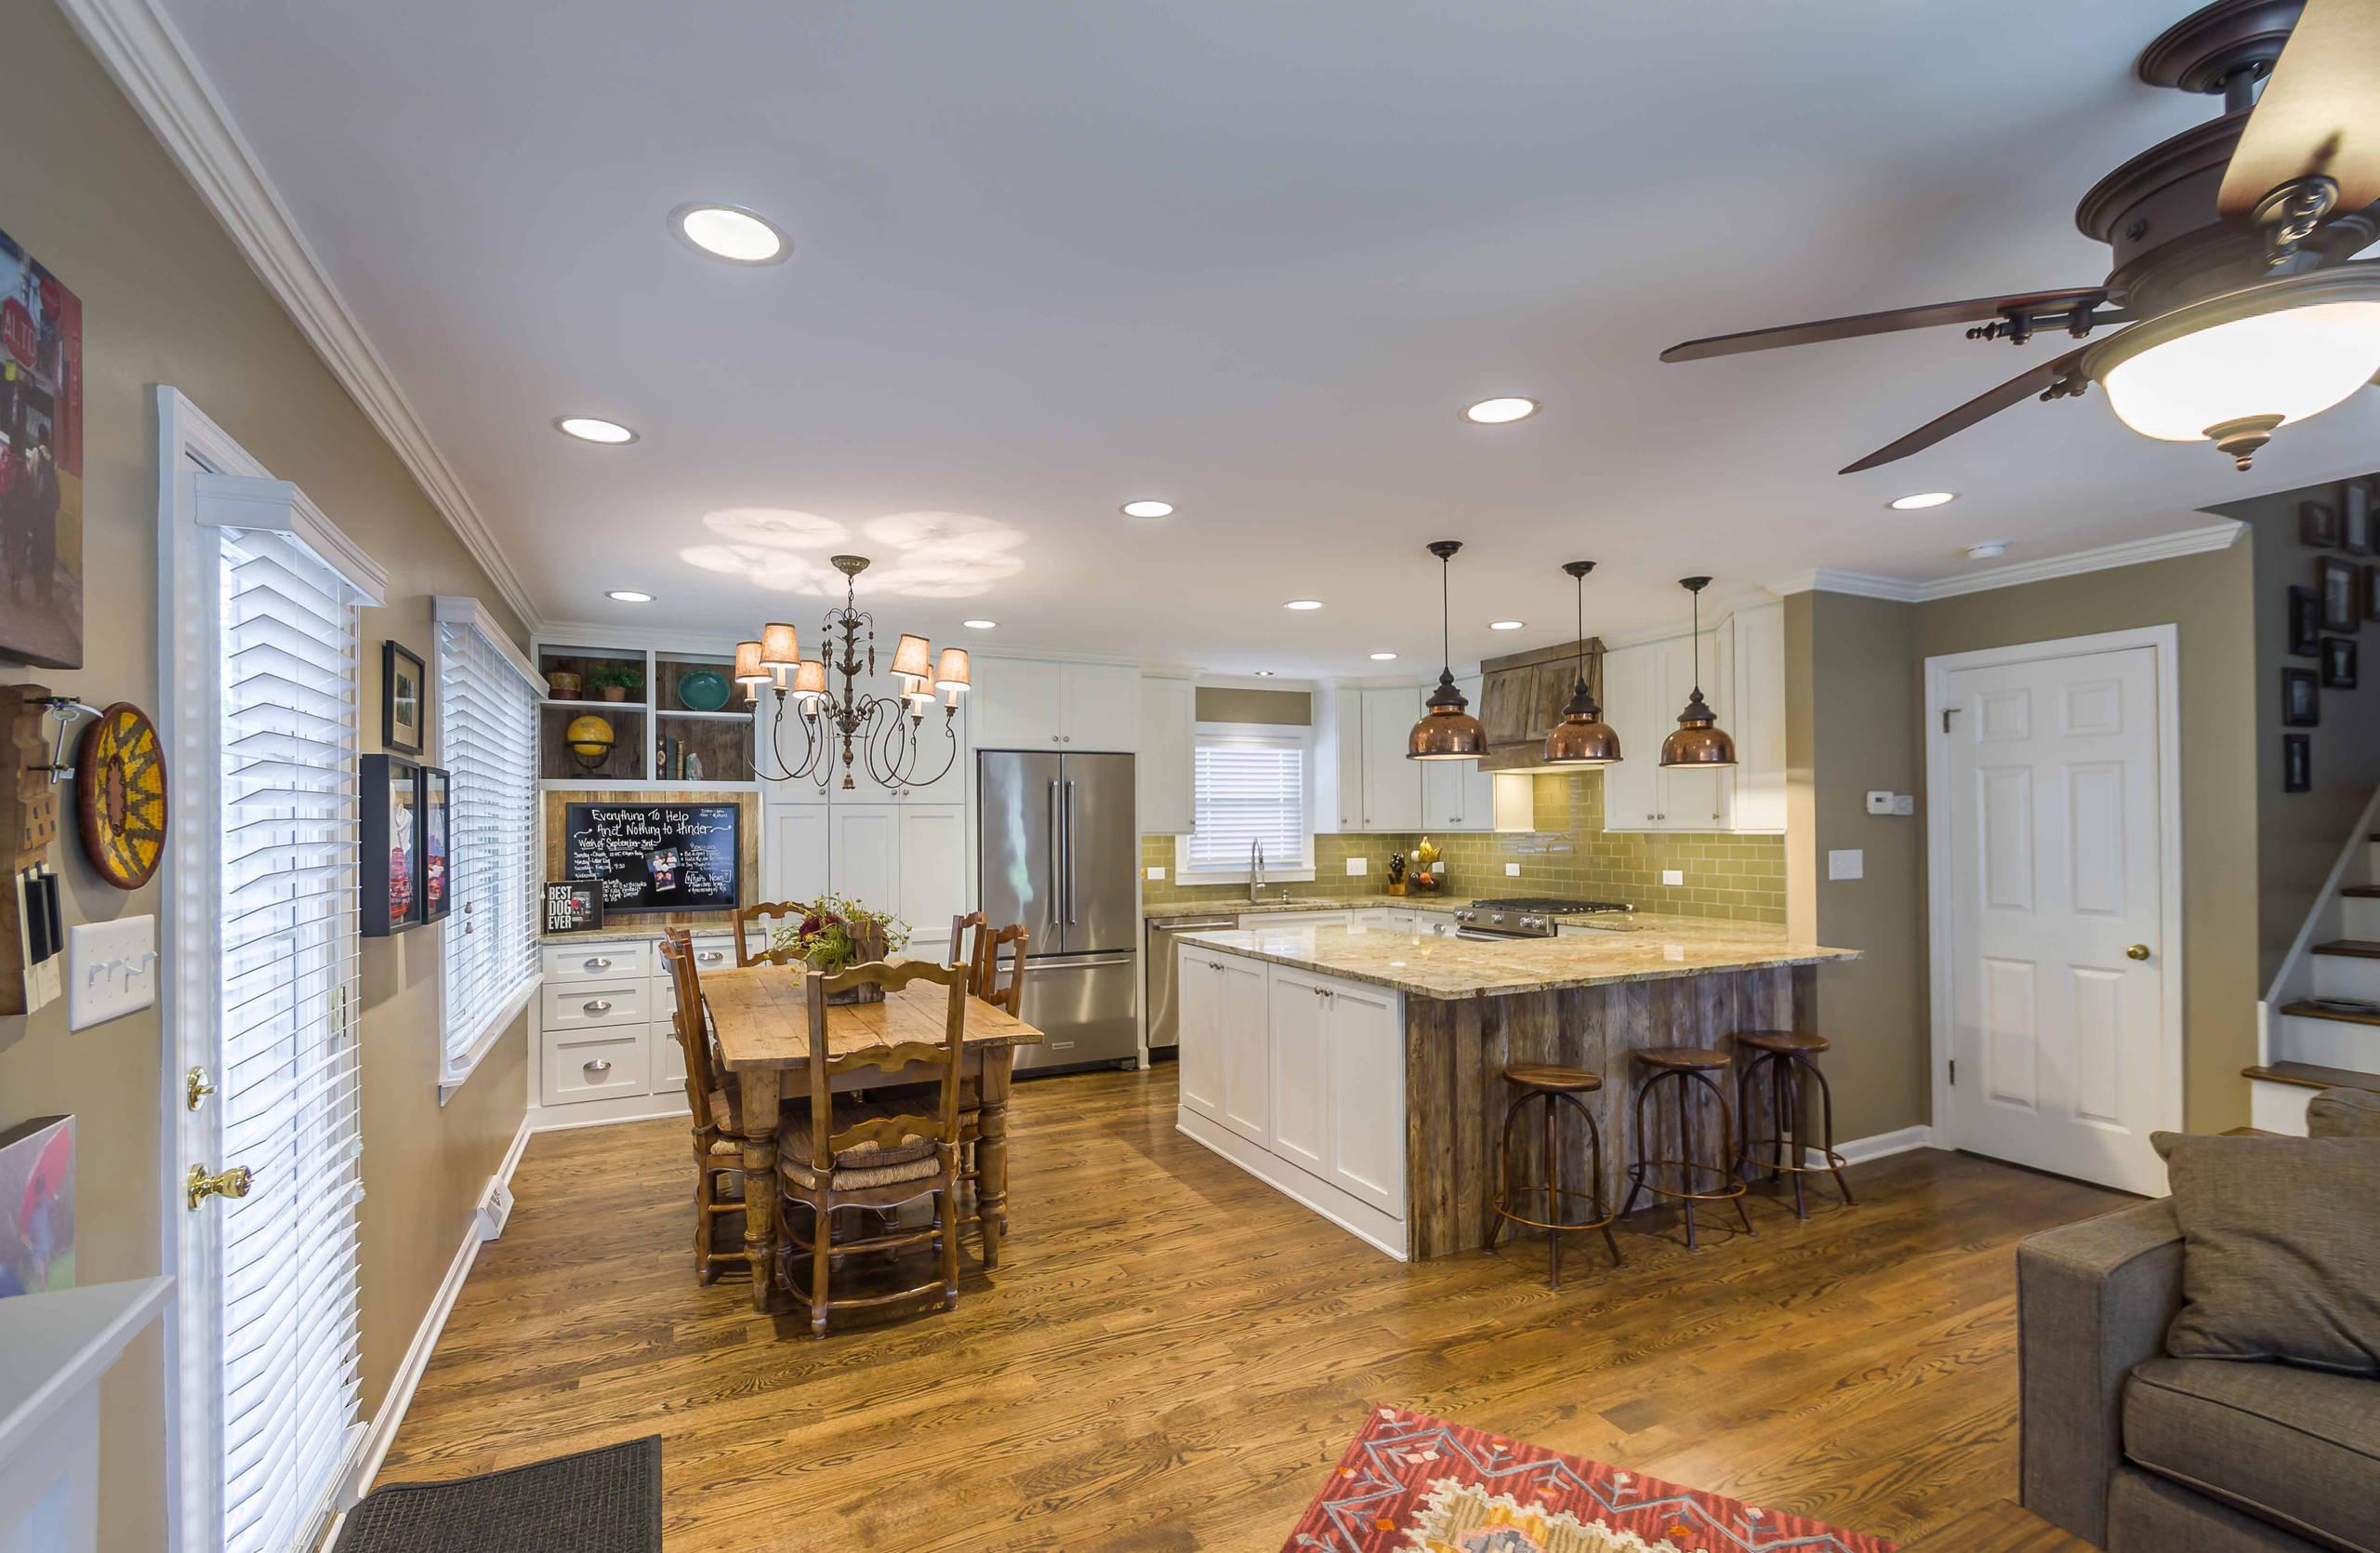 Refined Rustic Kitchen & Exterior Refresh